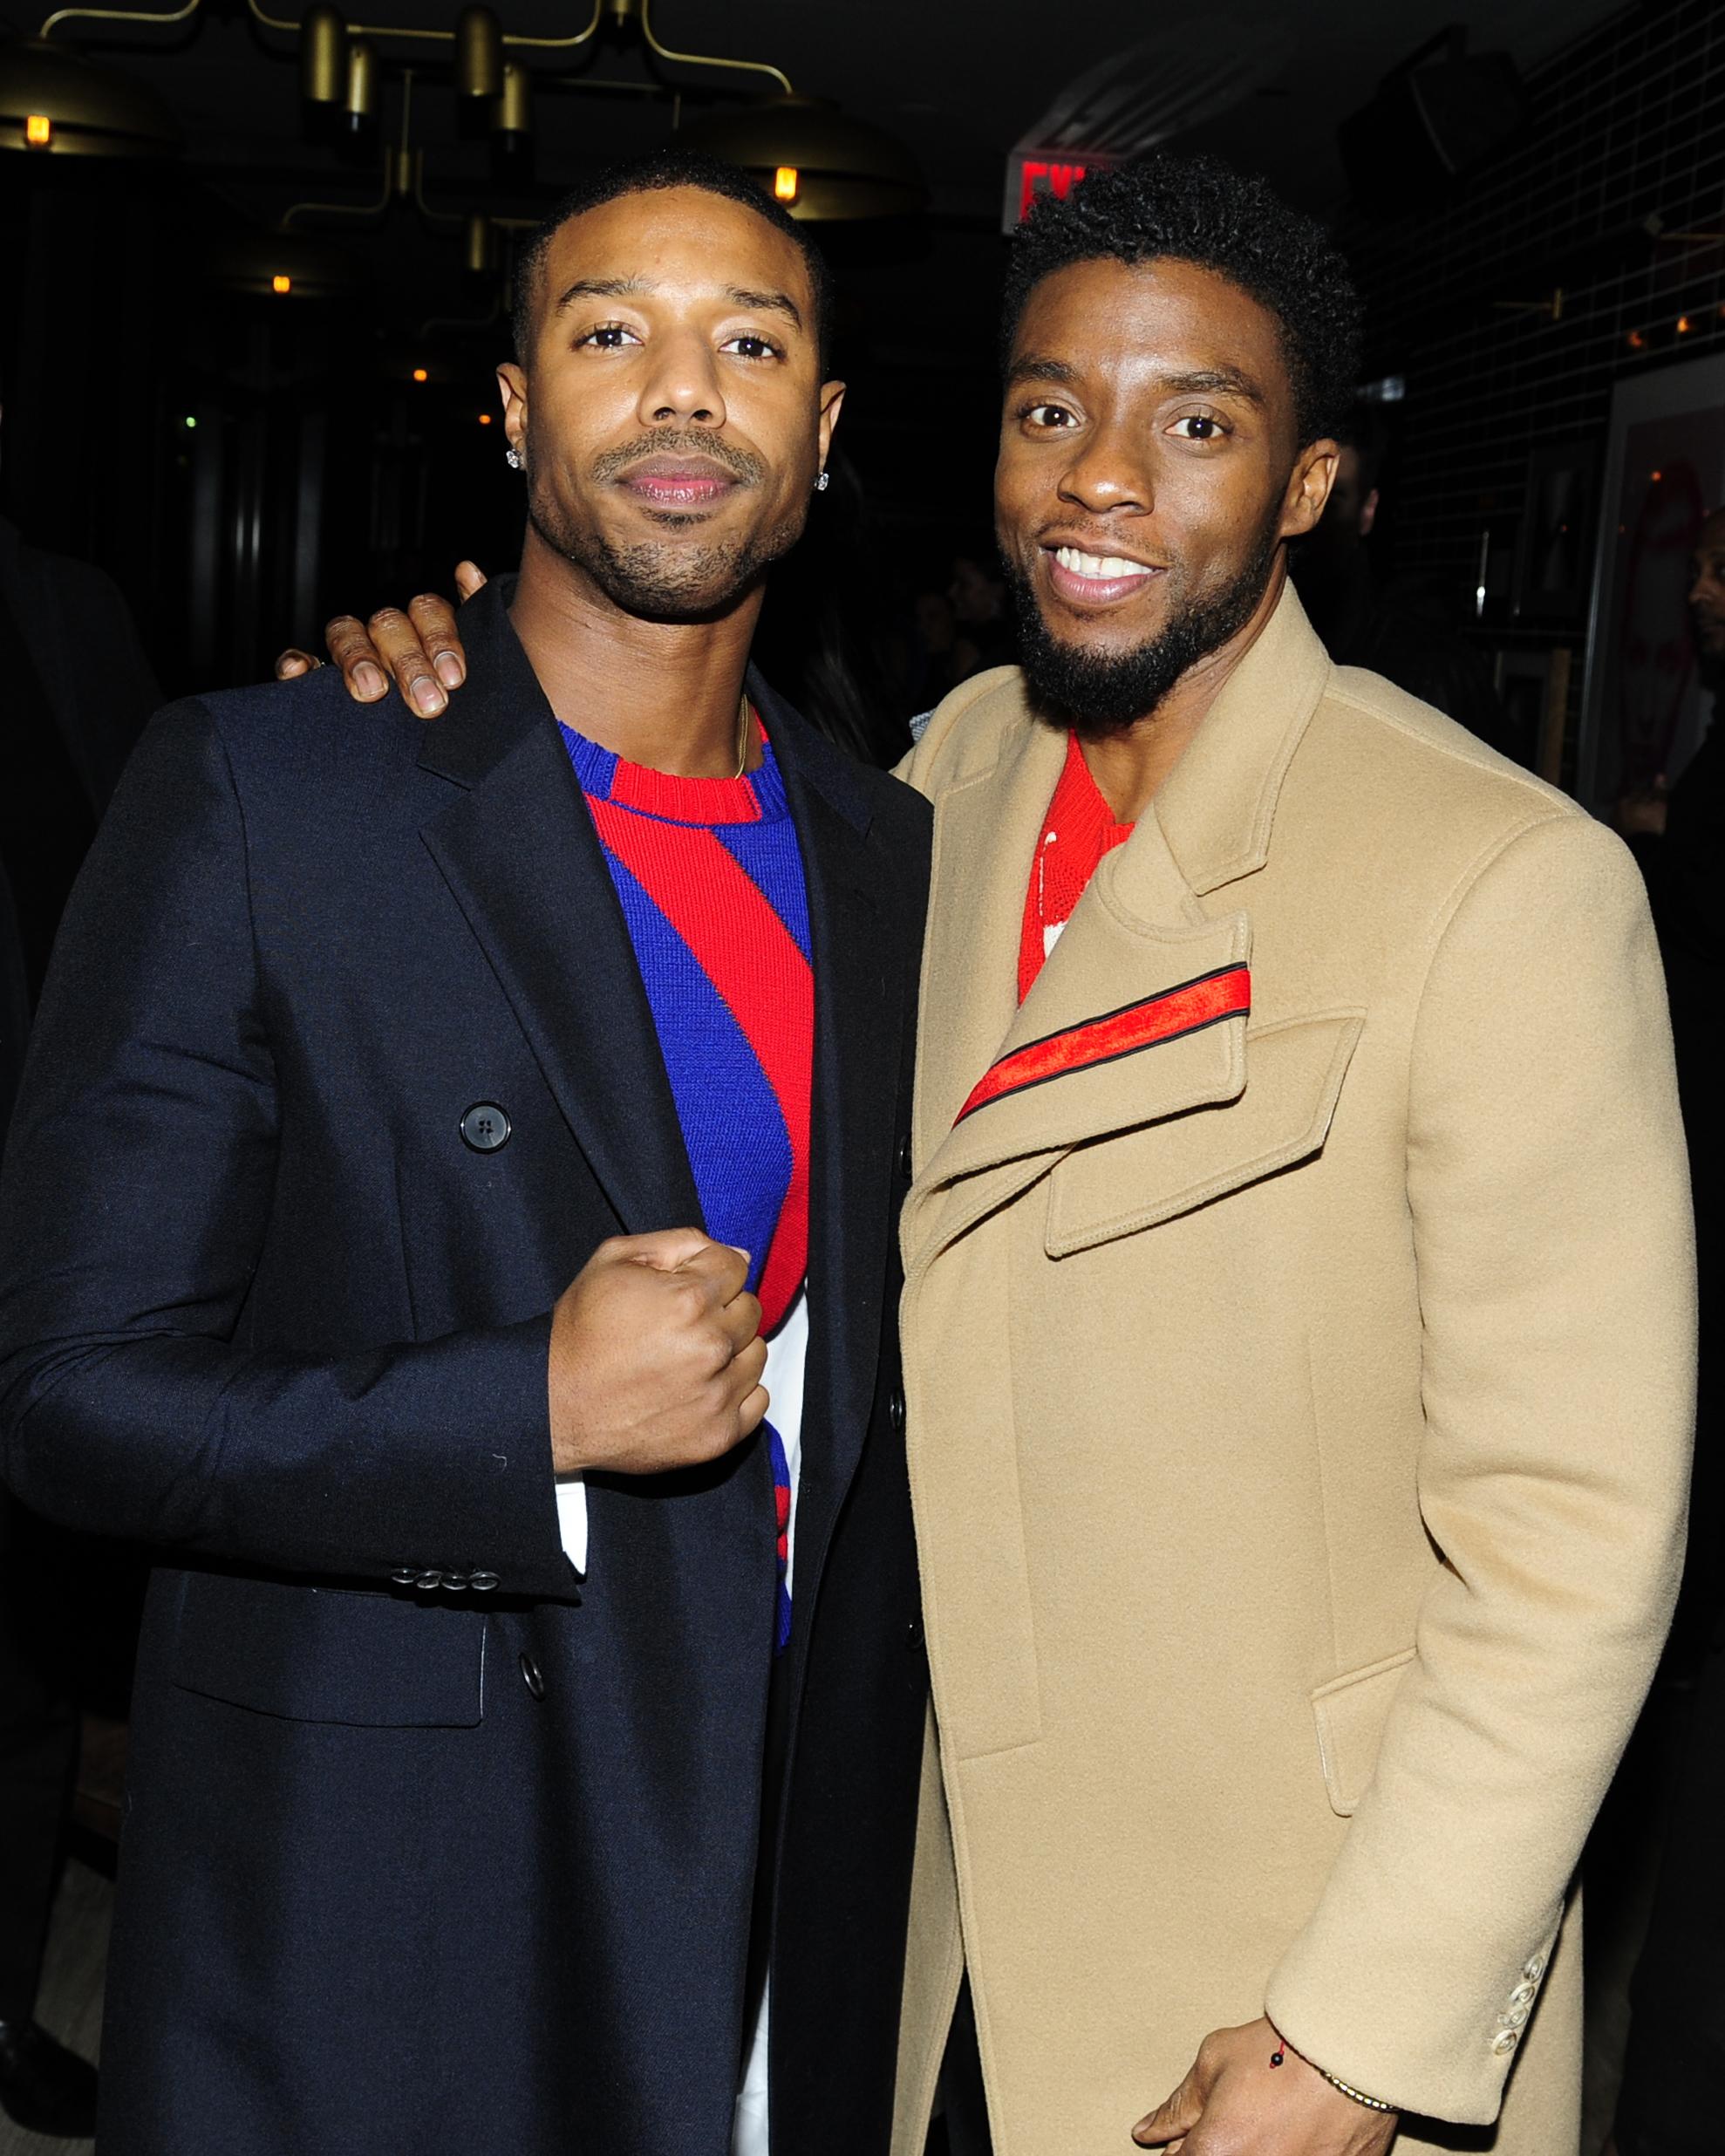 Michael B. Jordan and Chadwick Boseman